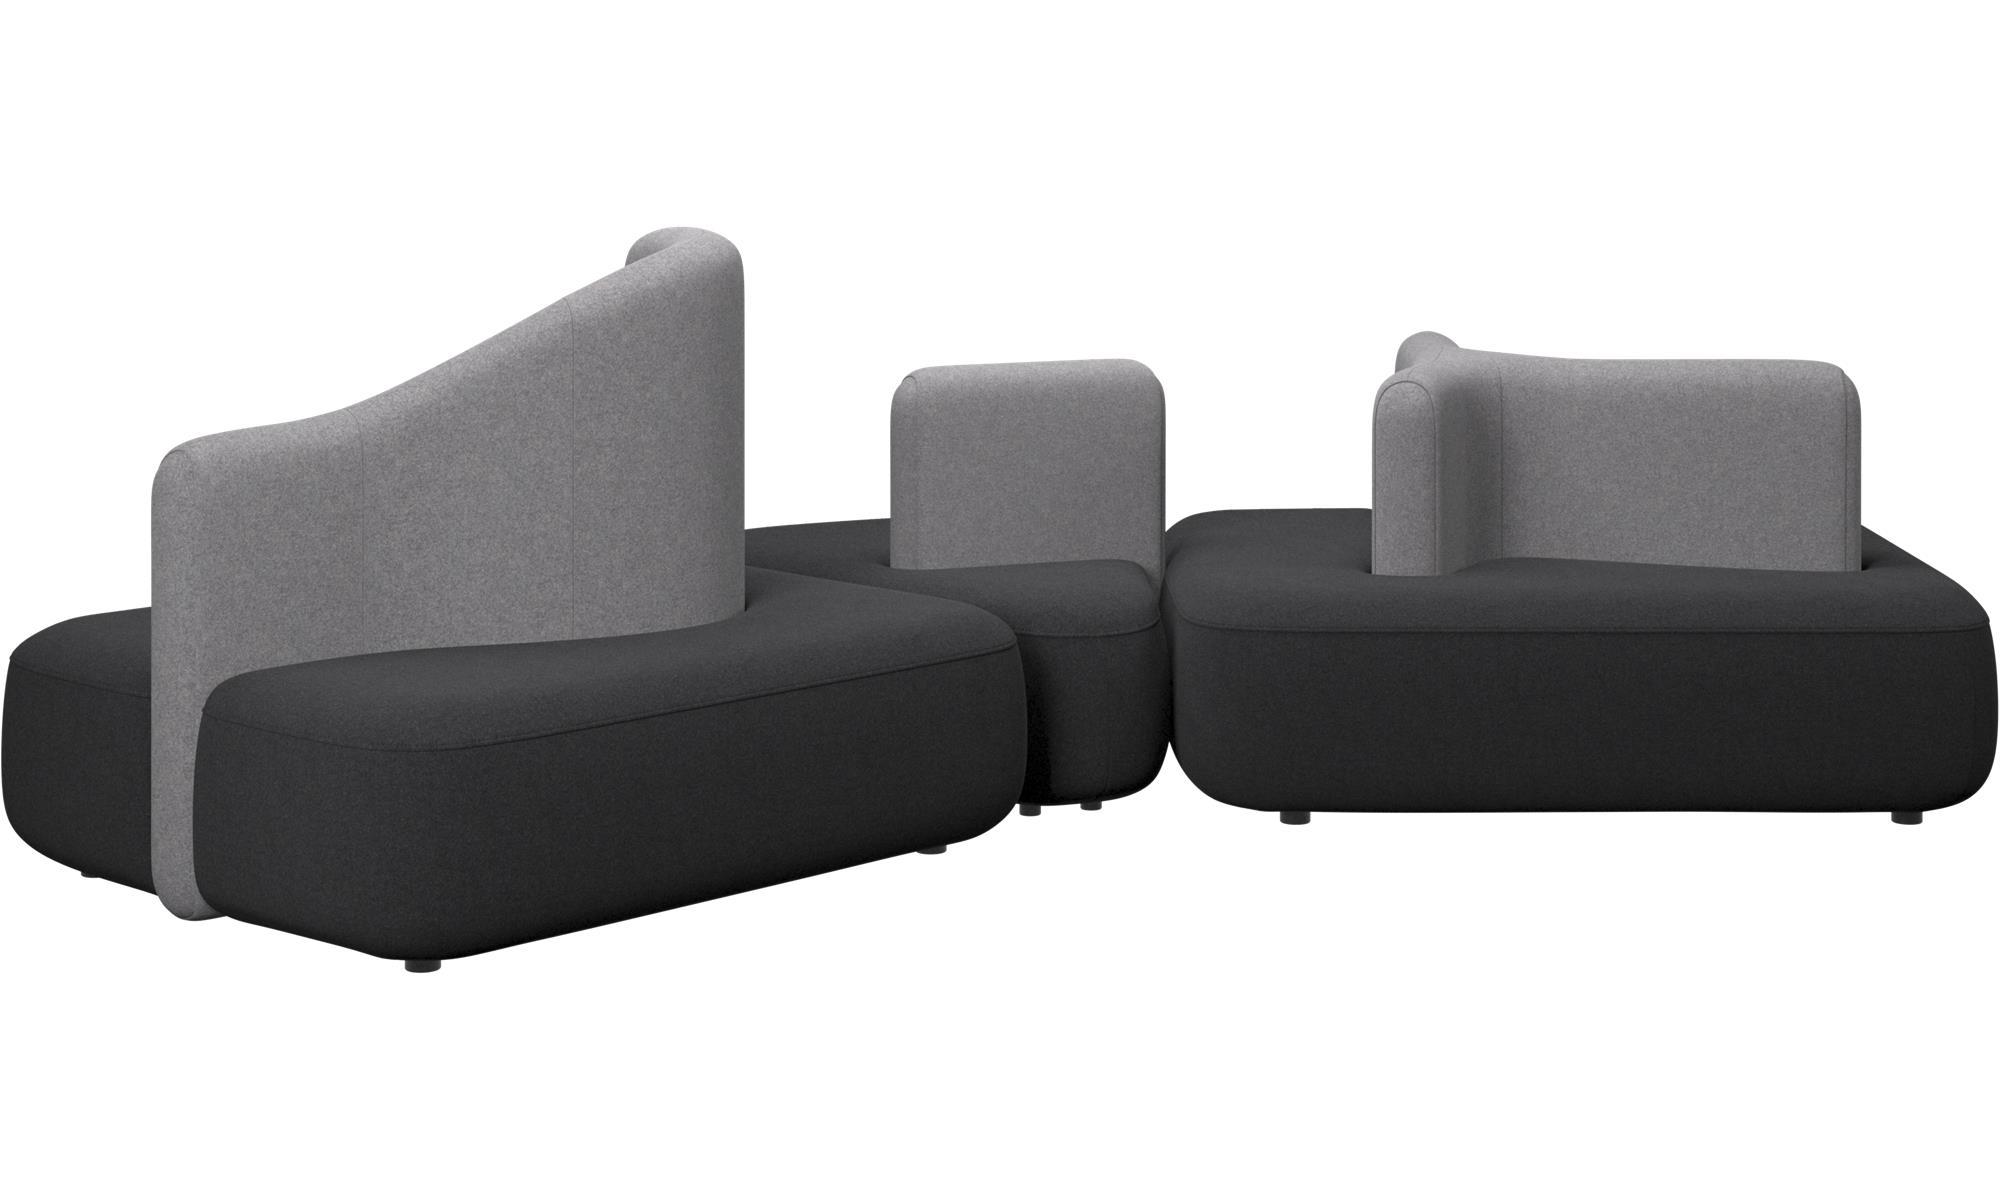 Outstanding Modular Sofas Ottawa Sofa Boconcept Machost Co Dining Chair Design Ideas Machostcouk